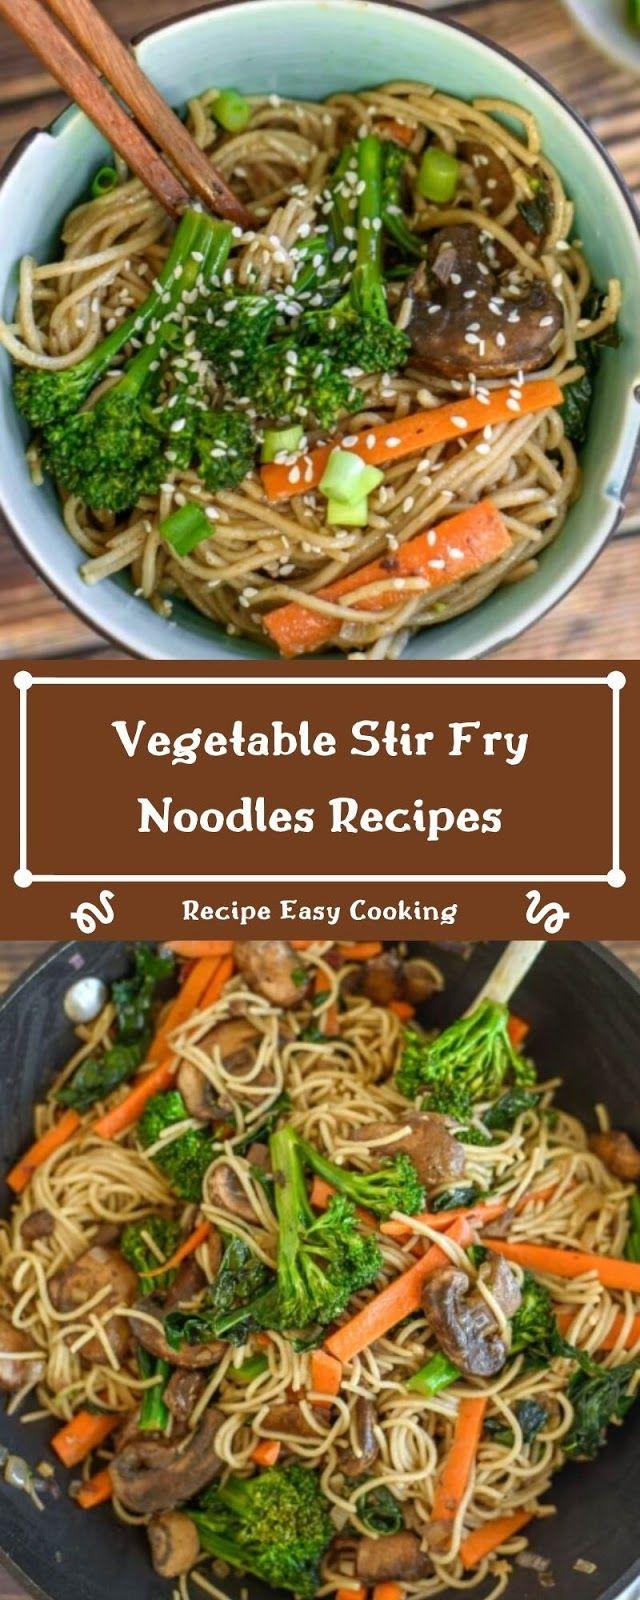 Photo of Vegetable Stir Fry Noodles Recipes